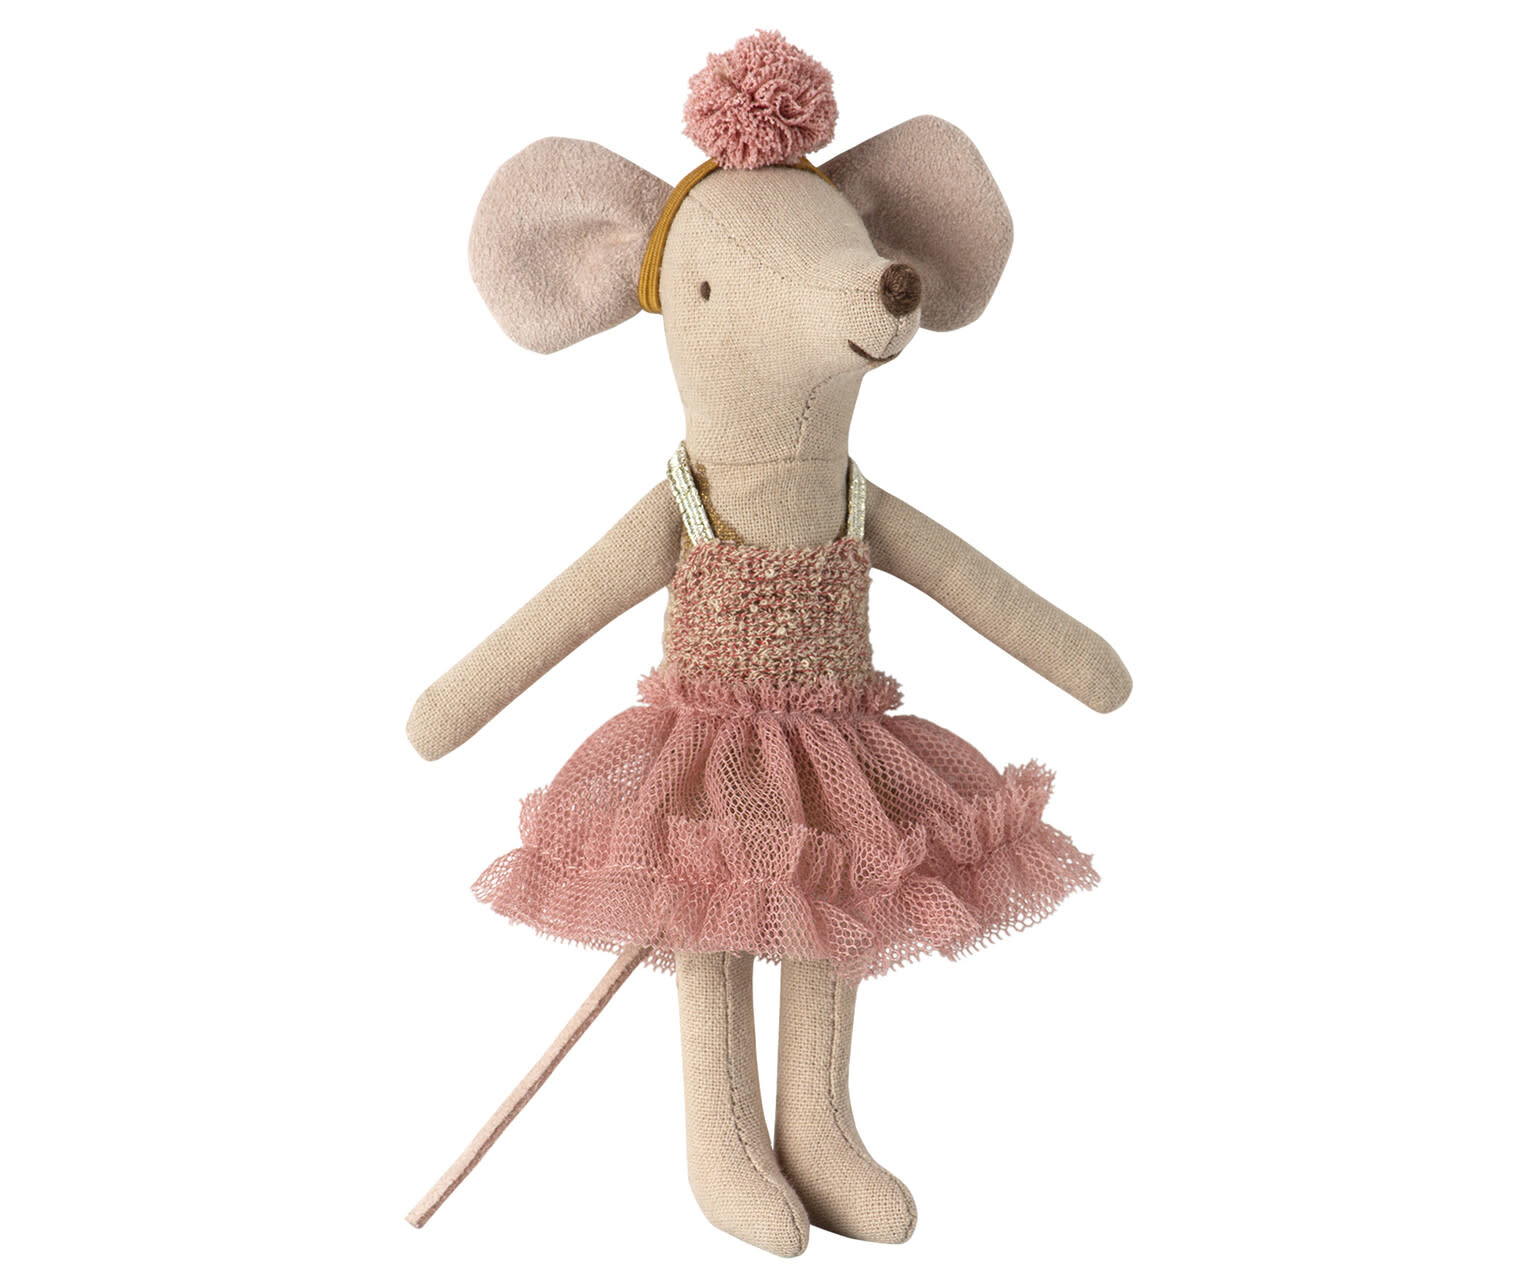 Dance mouse, big sister, mira belle-1